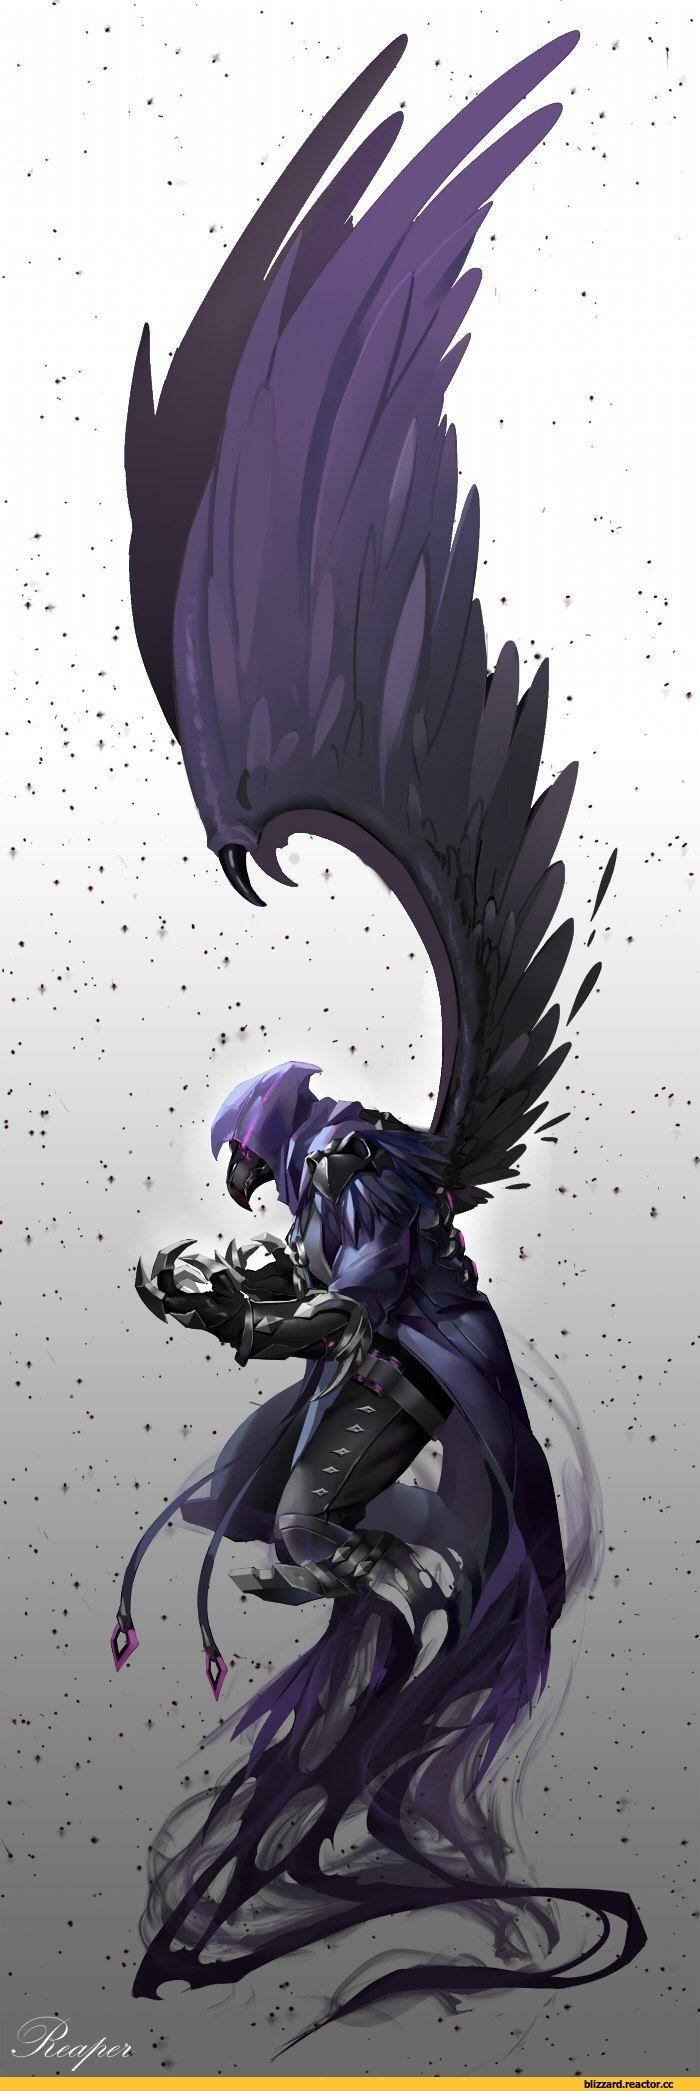 Blizzard,Blizzard Entertainment,фэндомы,Overwatch art,Overwatch,Reaper (Overwatch)